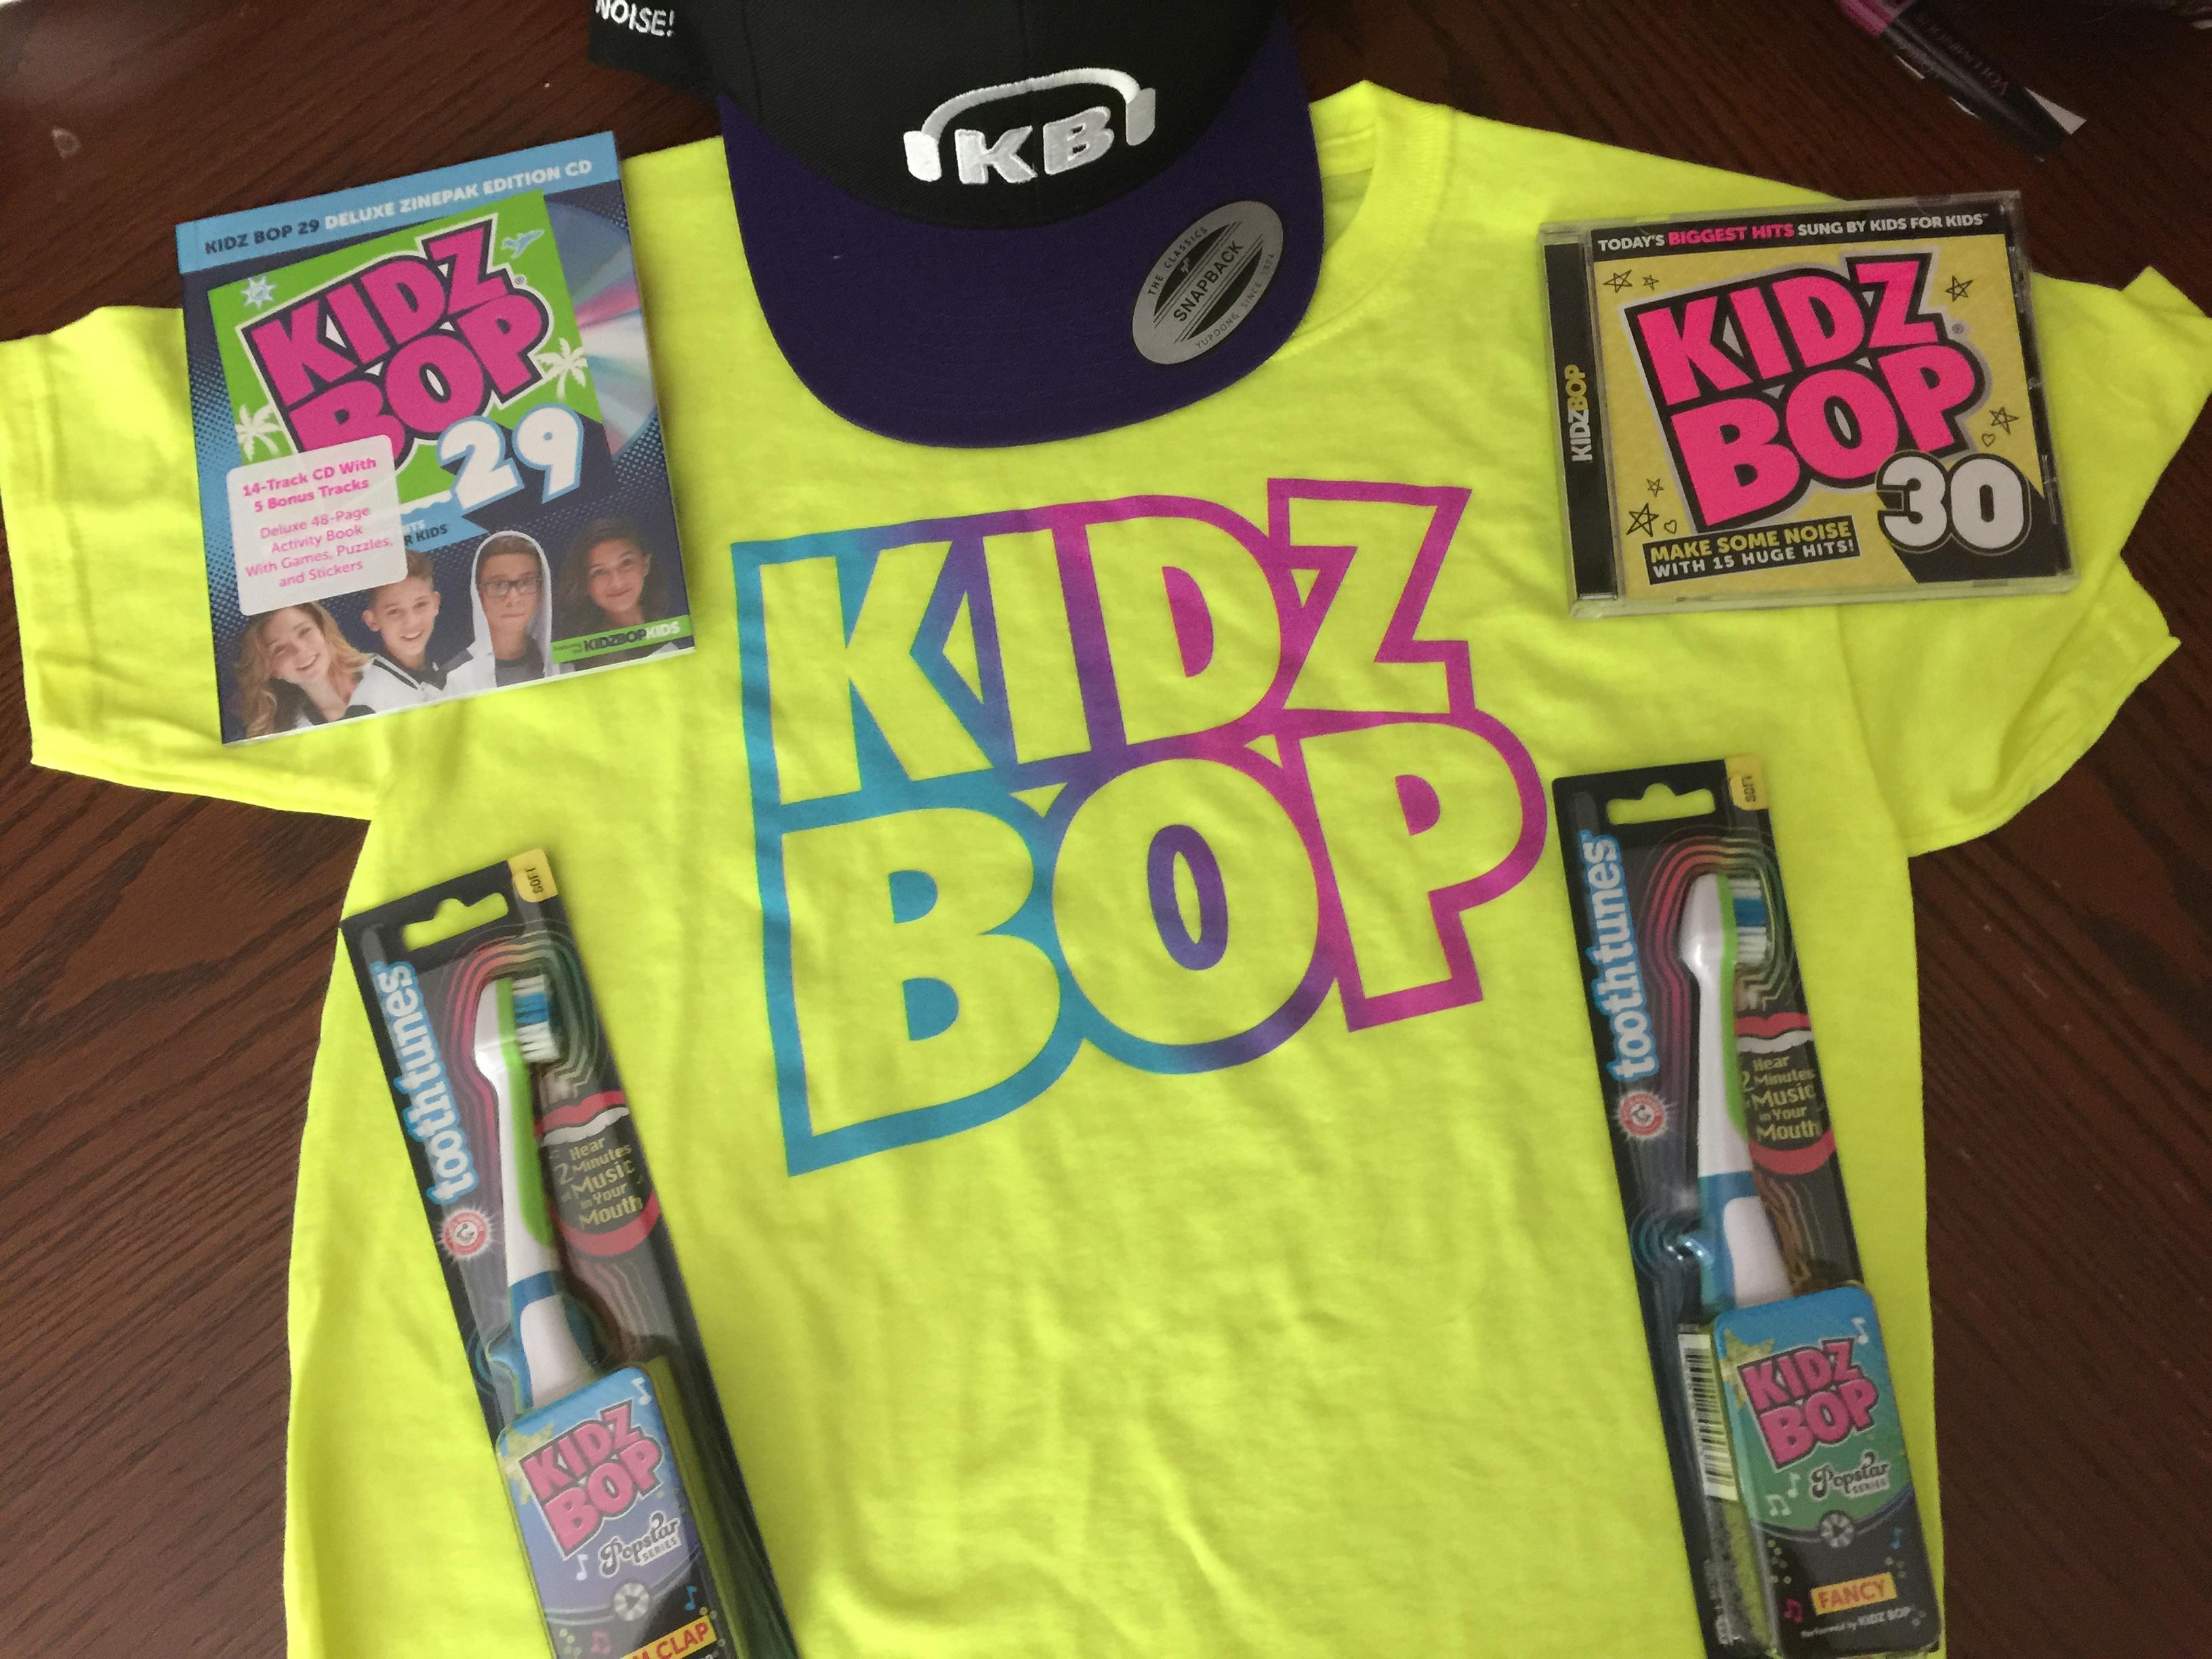 Kids Bop 30